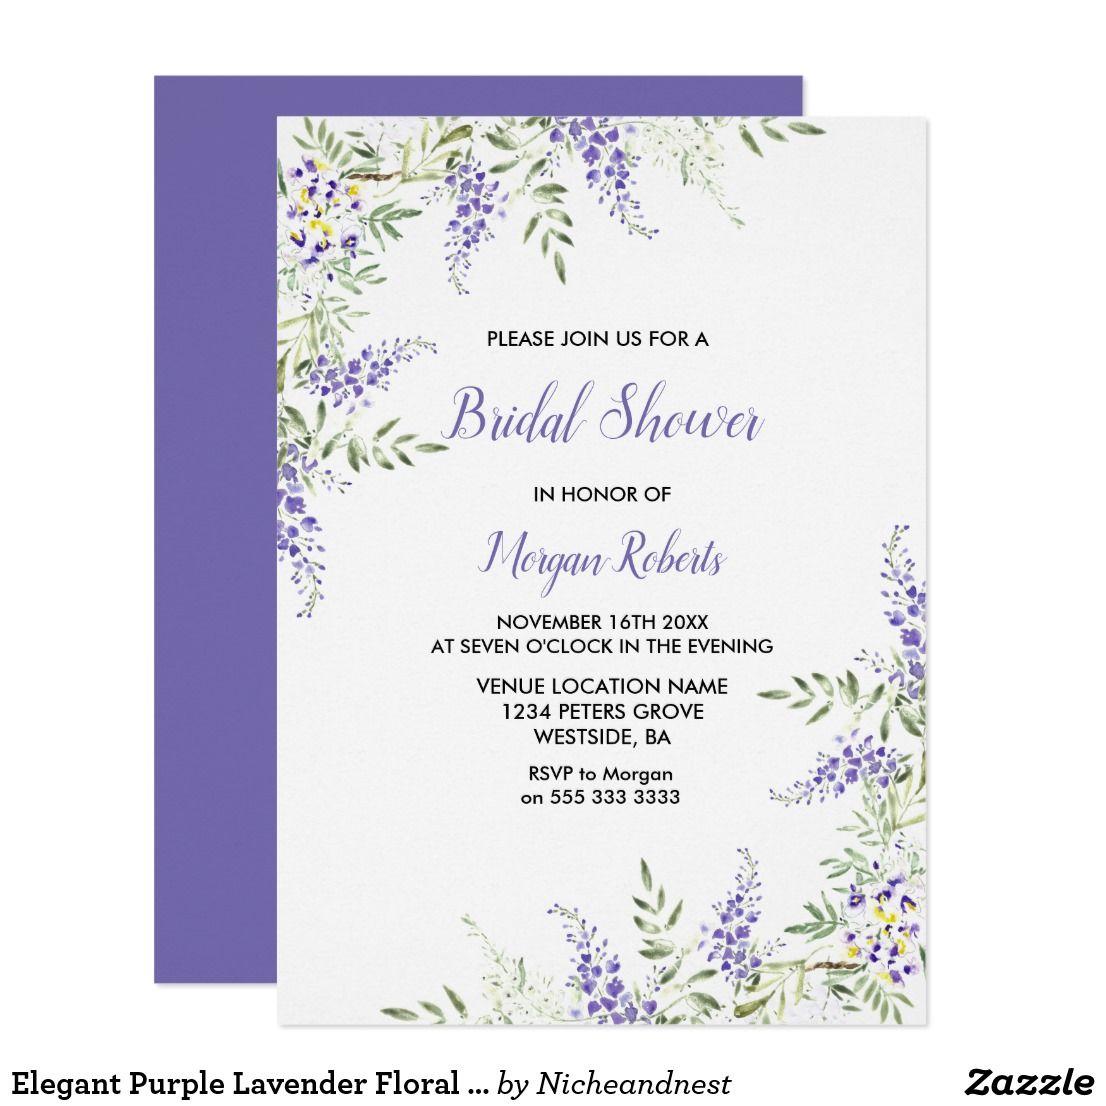 Lavender Bouquet Bridal Shower Wedding Invitations